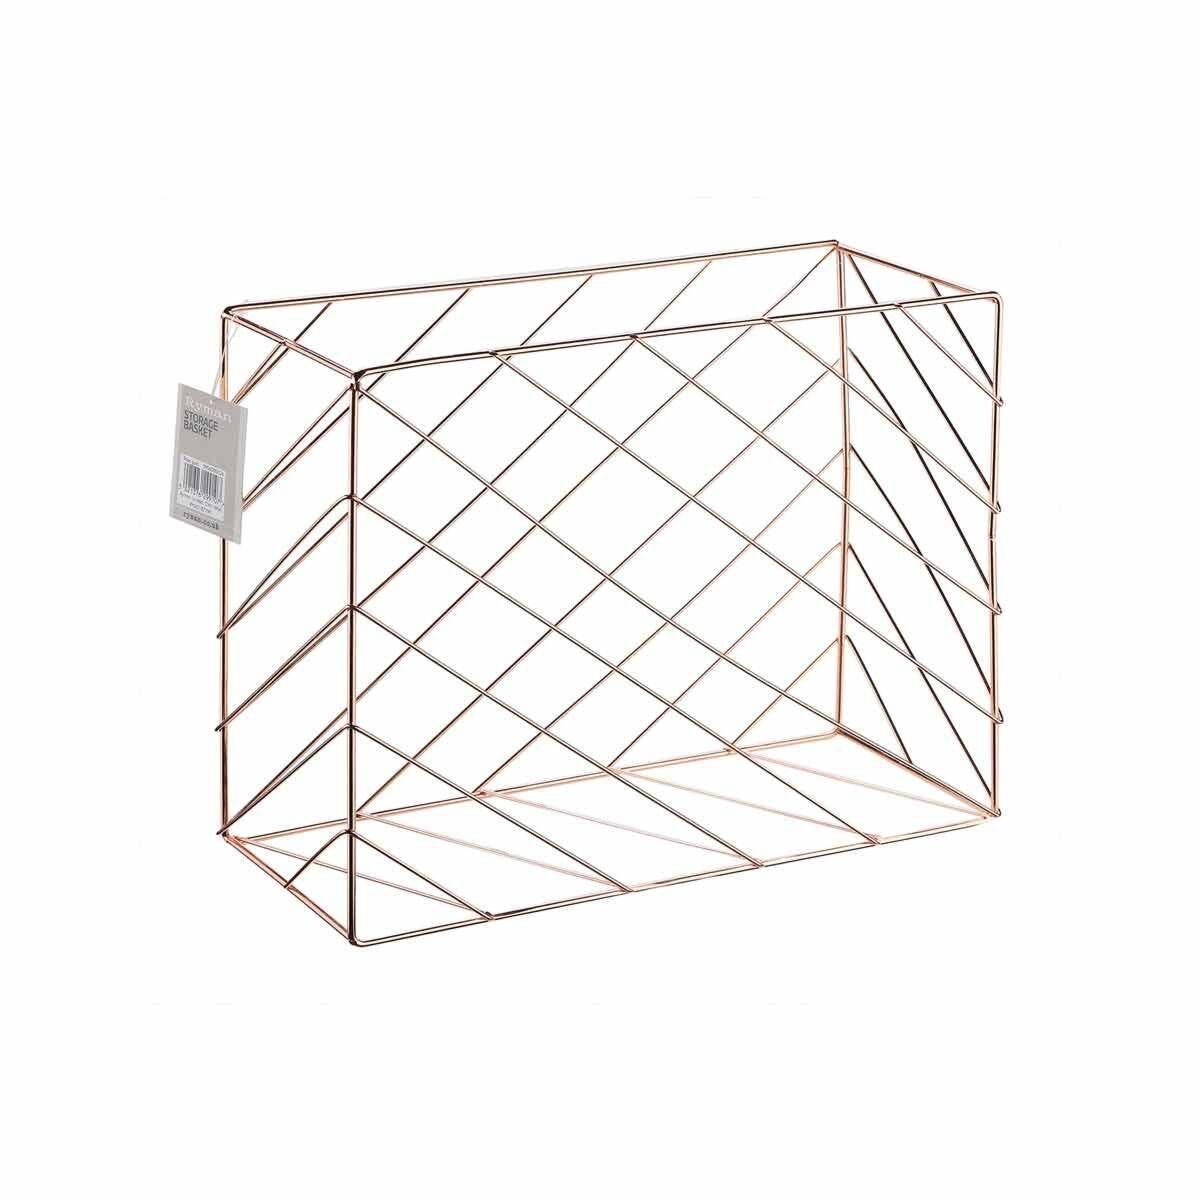 Ryman Metal Desk Storage Basket Rose Gold